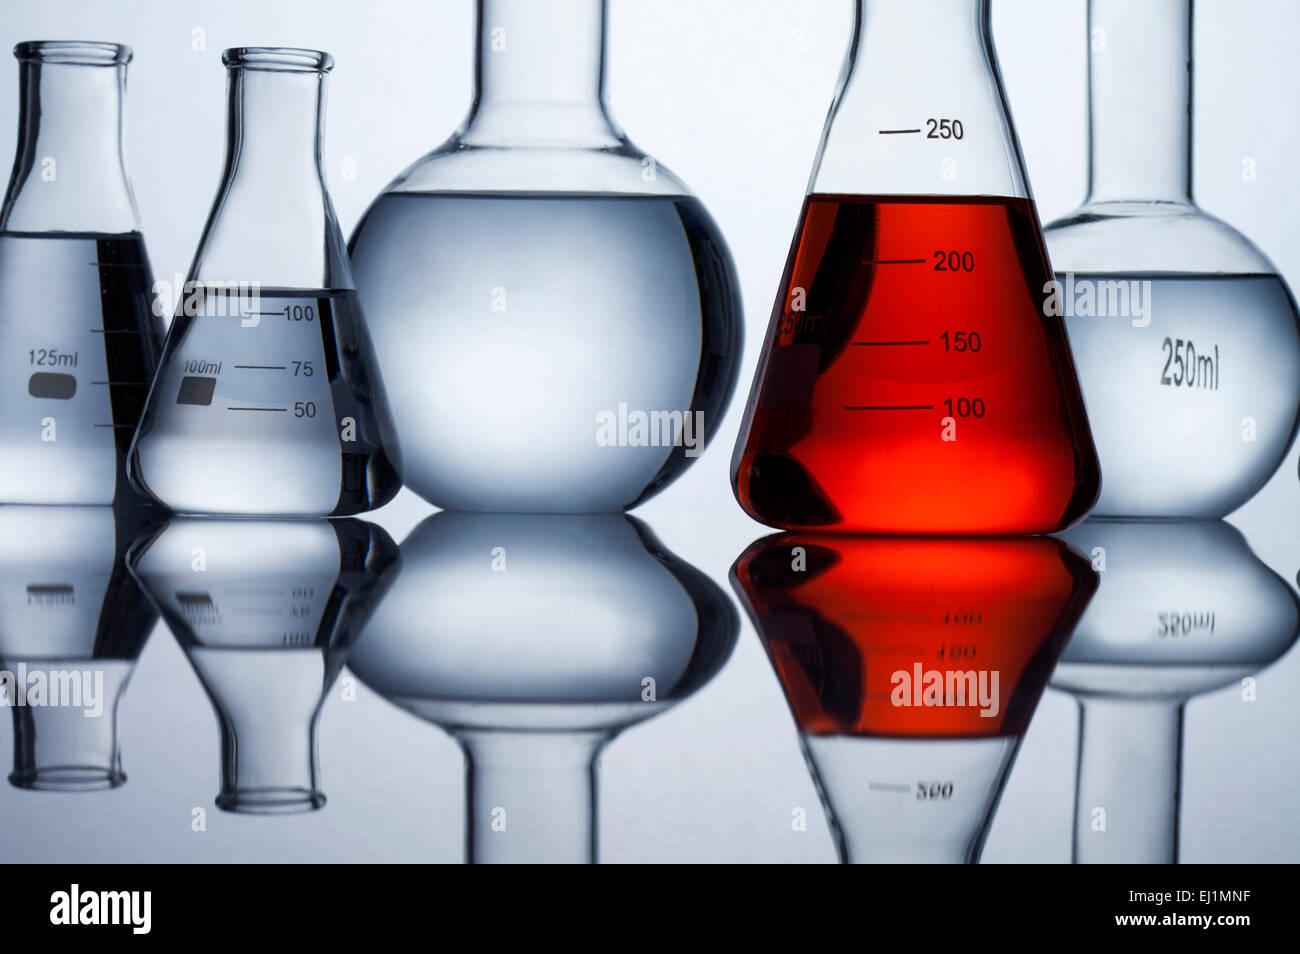 Healthcare And Medicine,Glassware,Utensil,Flask,Conical Flask Stock Photo